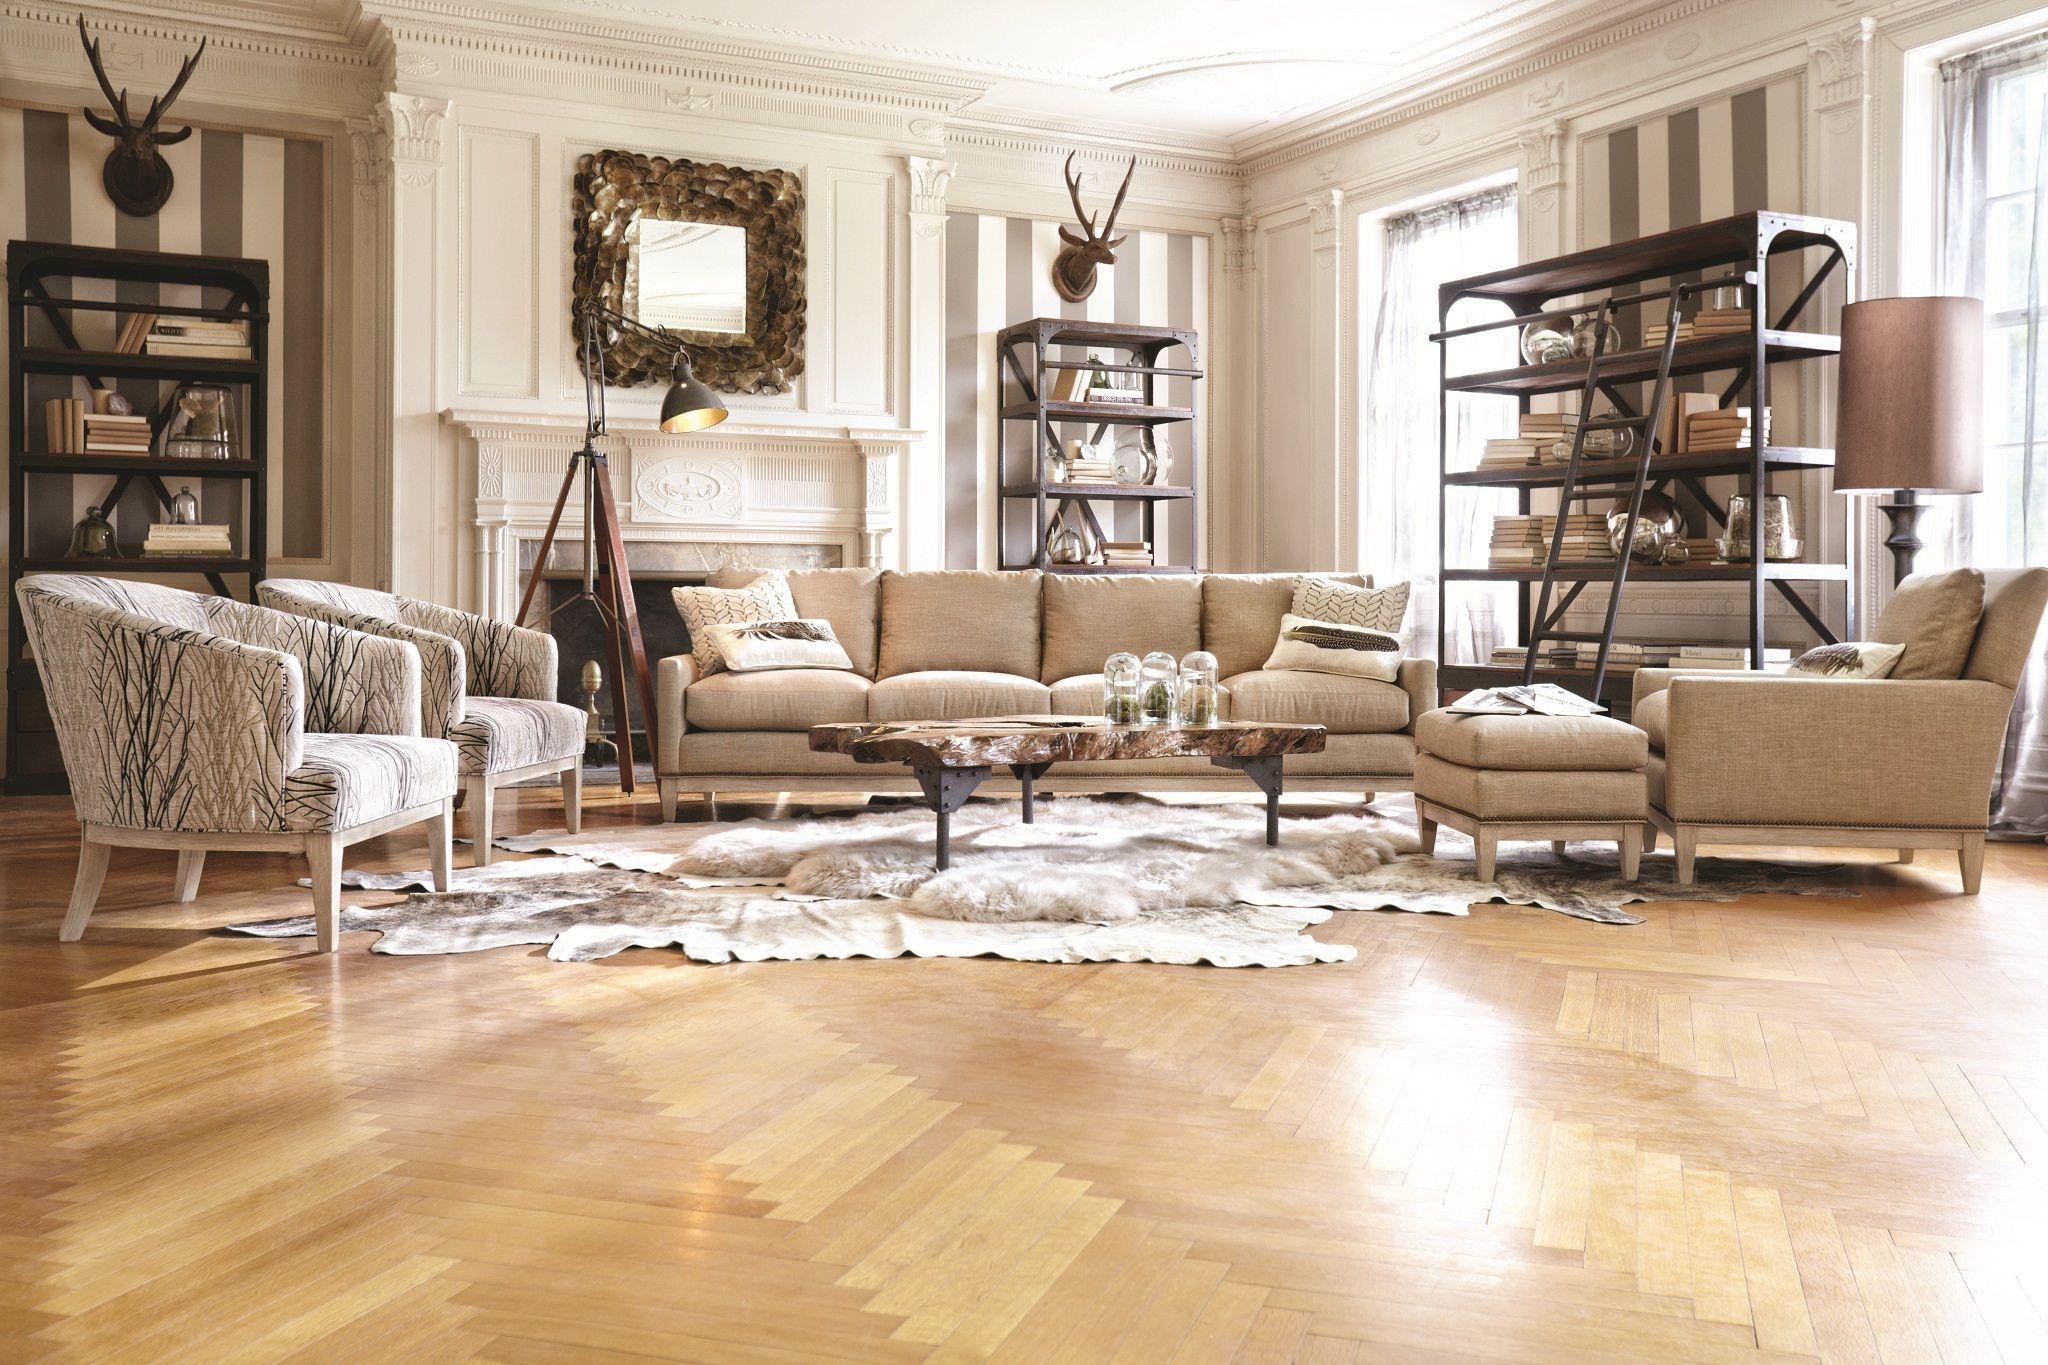 arhaus leather sofa dark gray living room ideas dante home and textiles